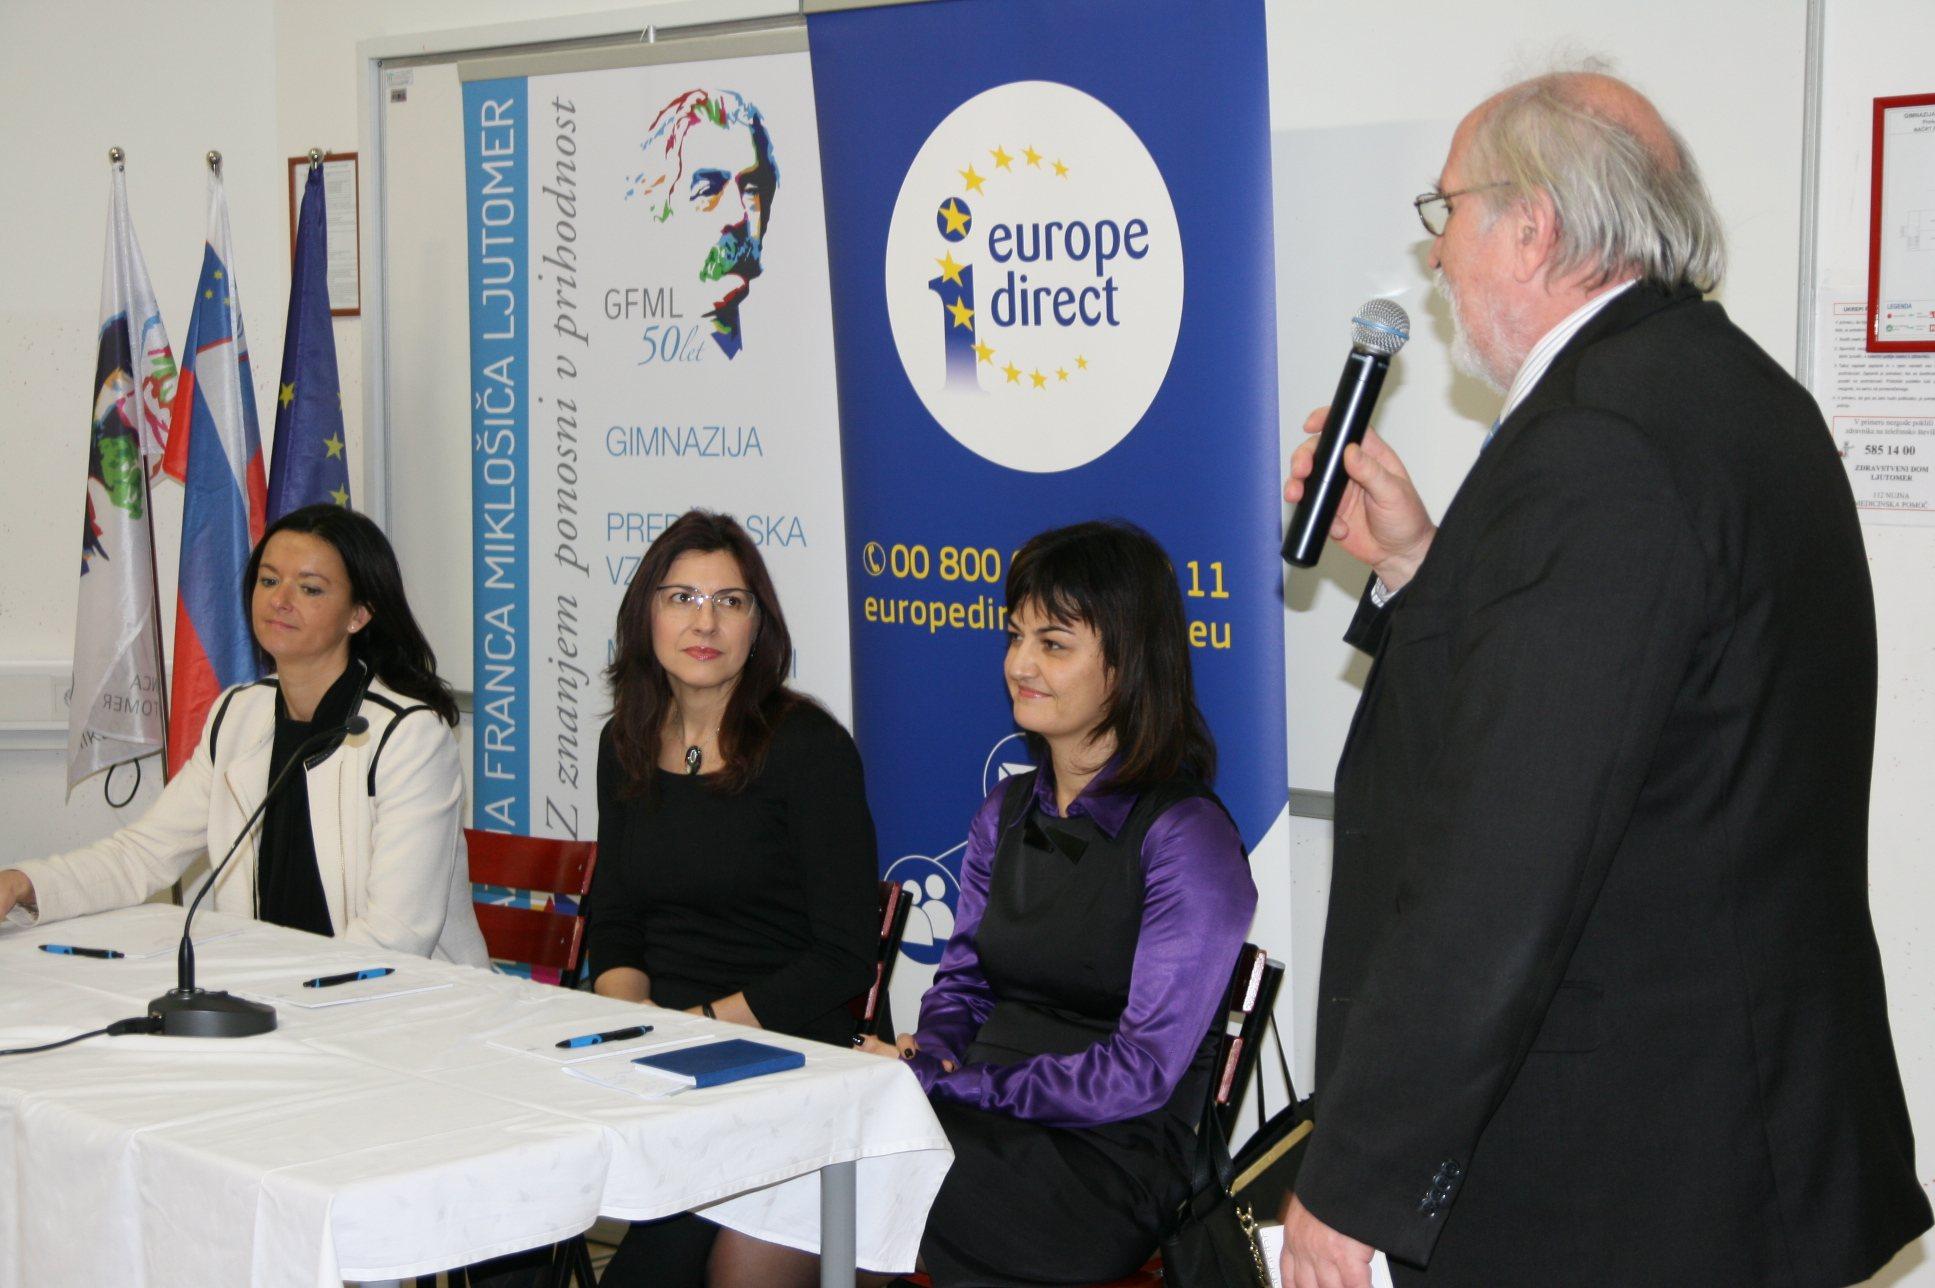 V Ljutomeru so govorili o prihodnosti EU.